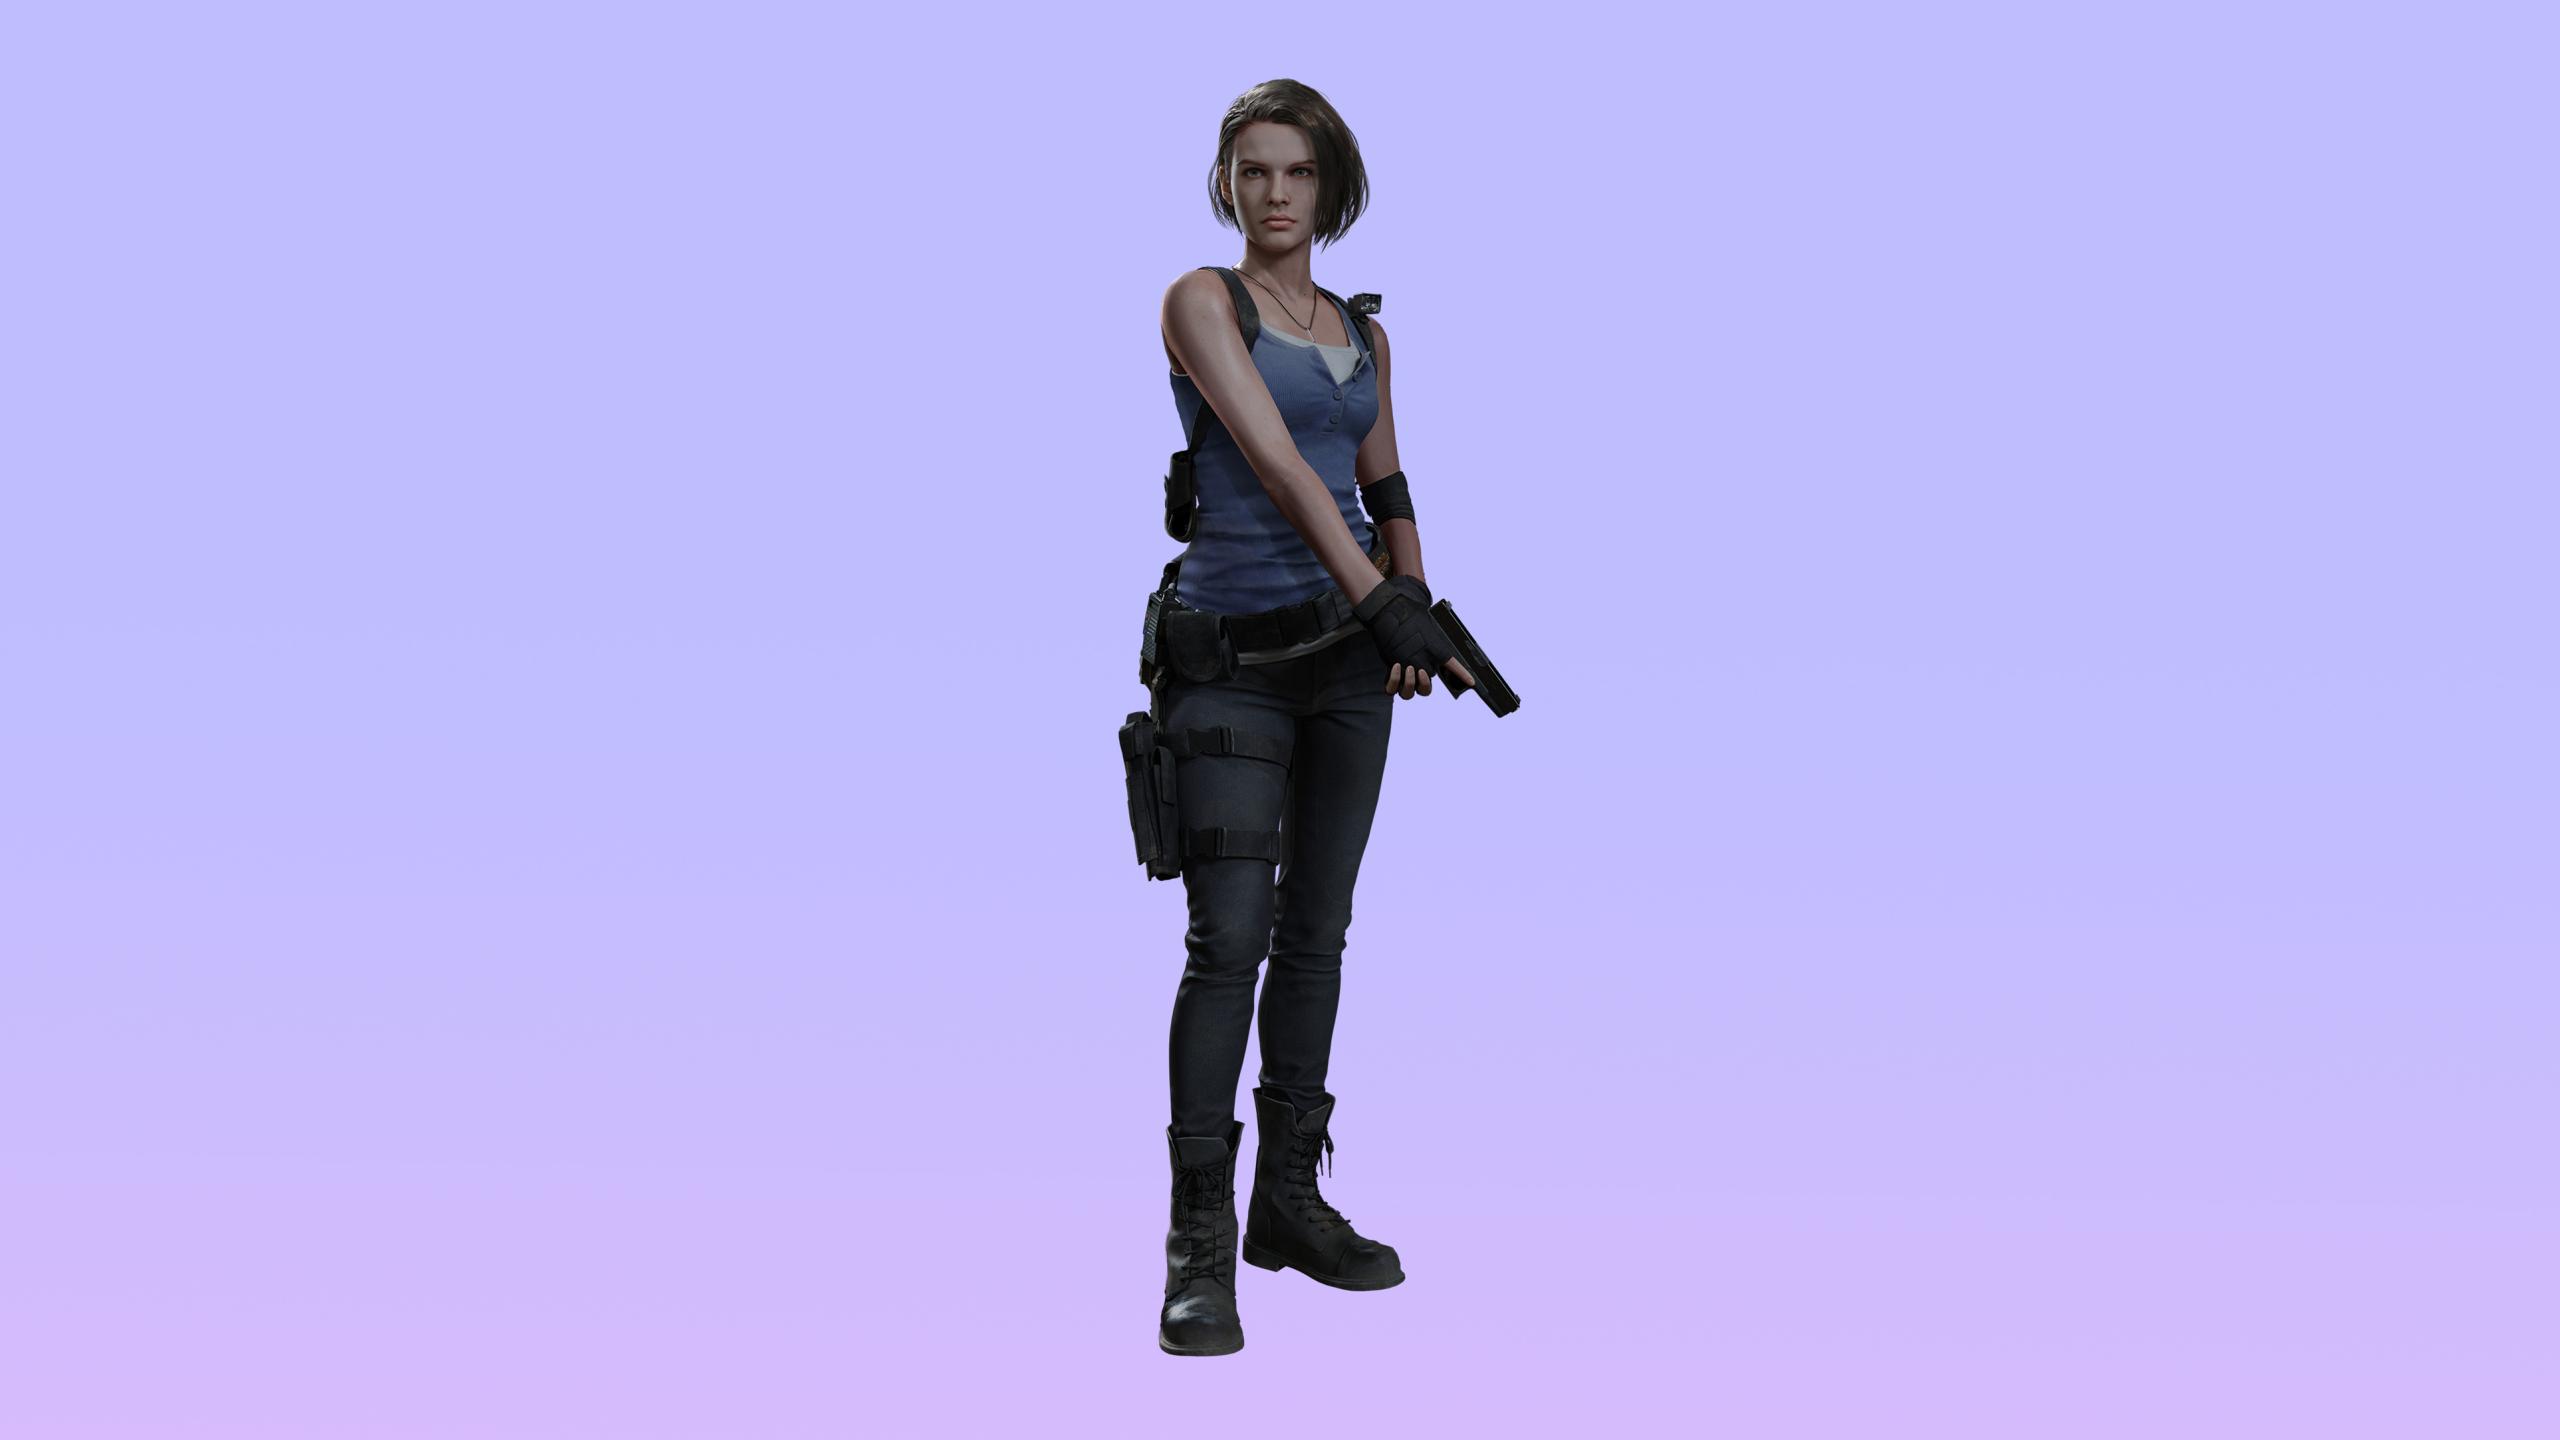 2560x1440 Jill Valentine Resident Evil 3 Remake 4k 1440p